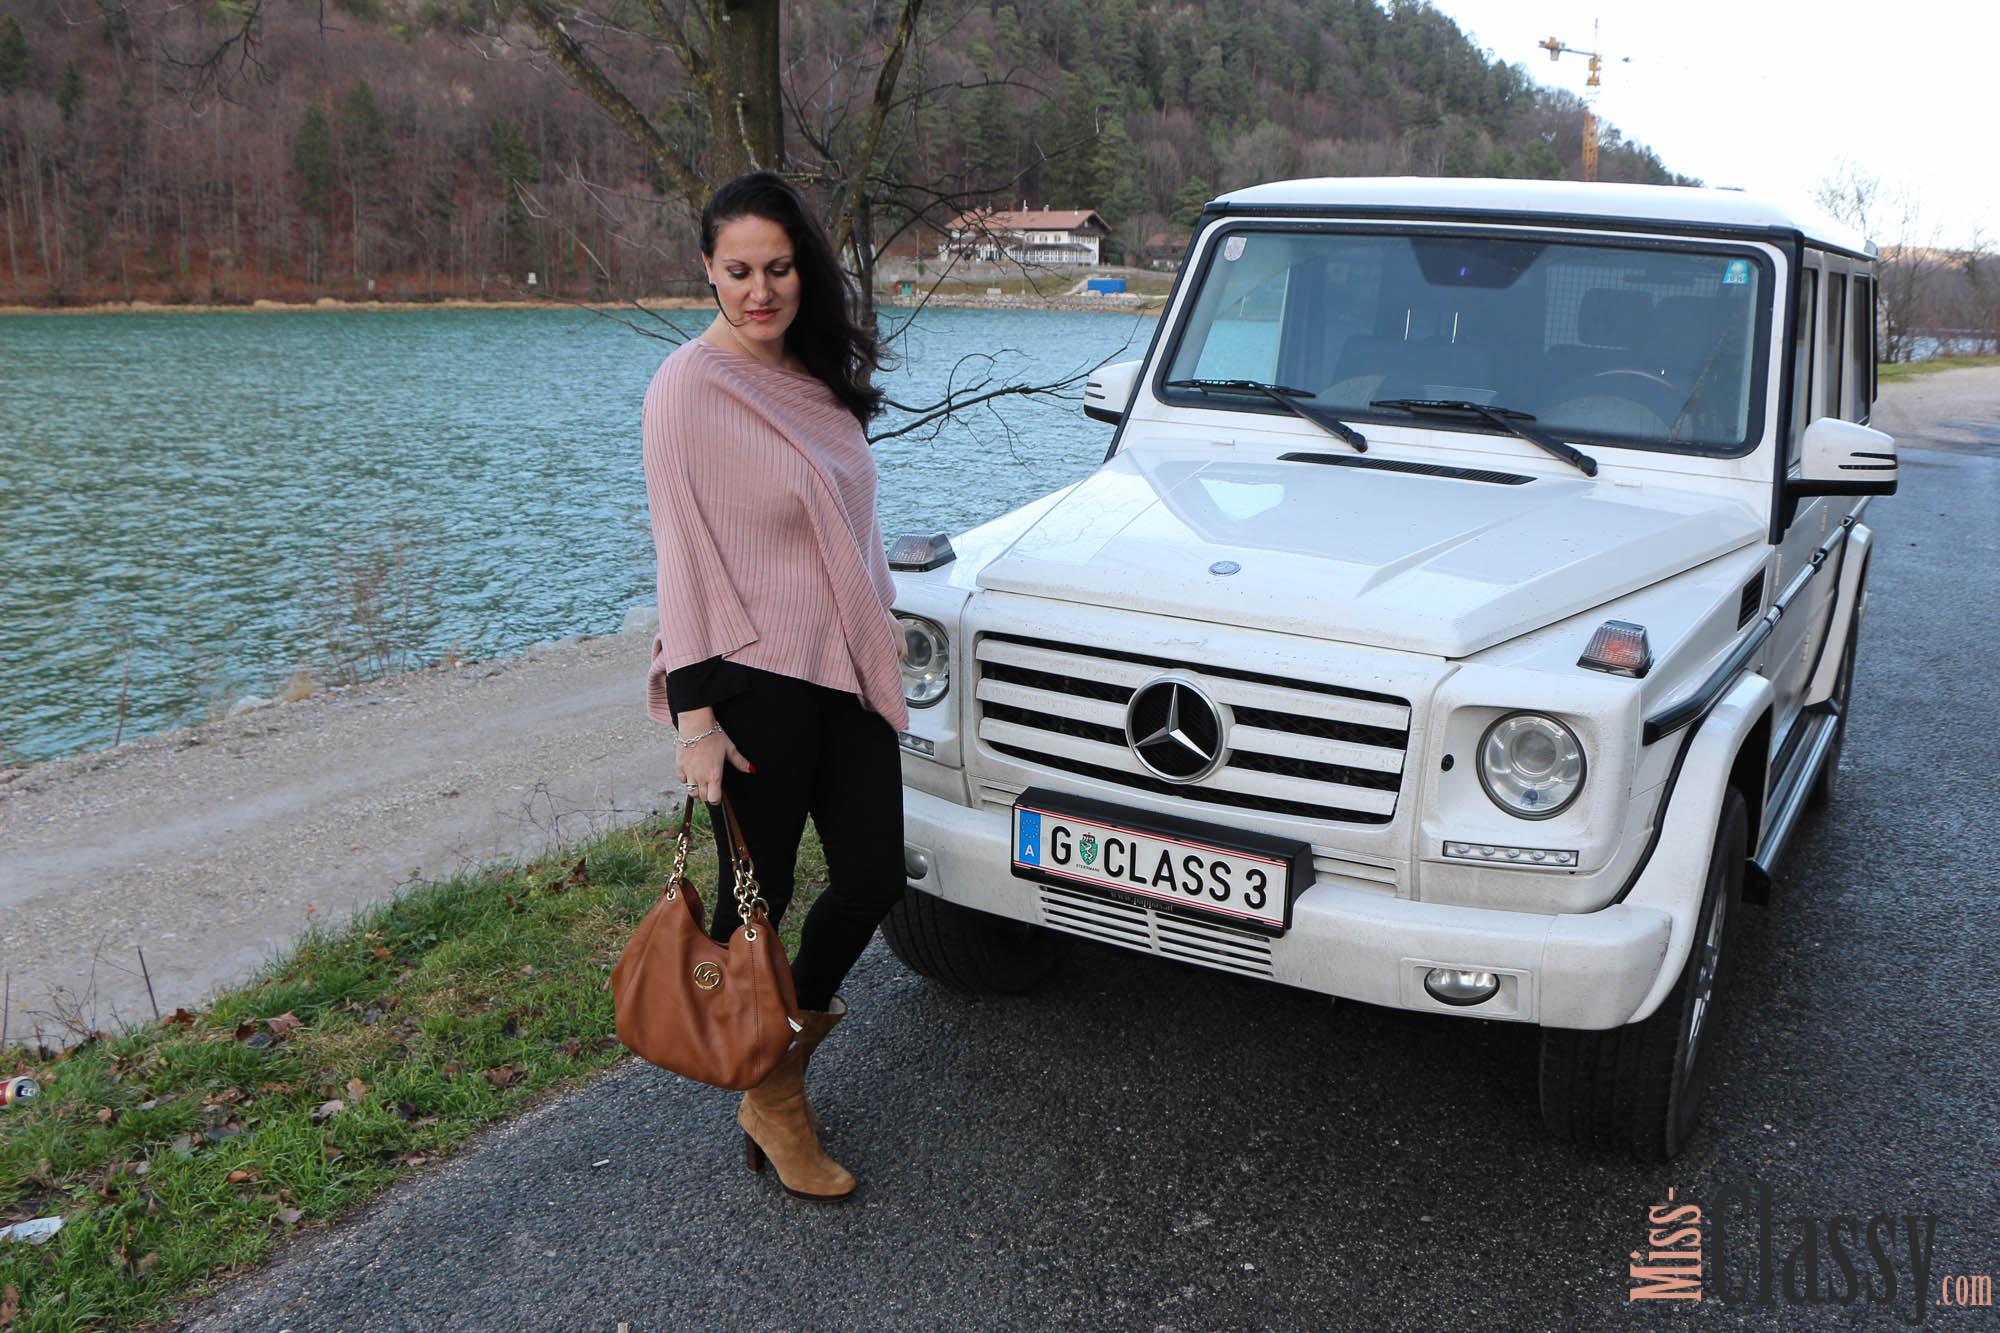 Miss Classy loves the Mercedes-Benz G Class